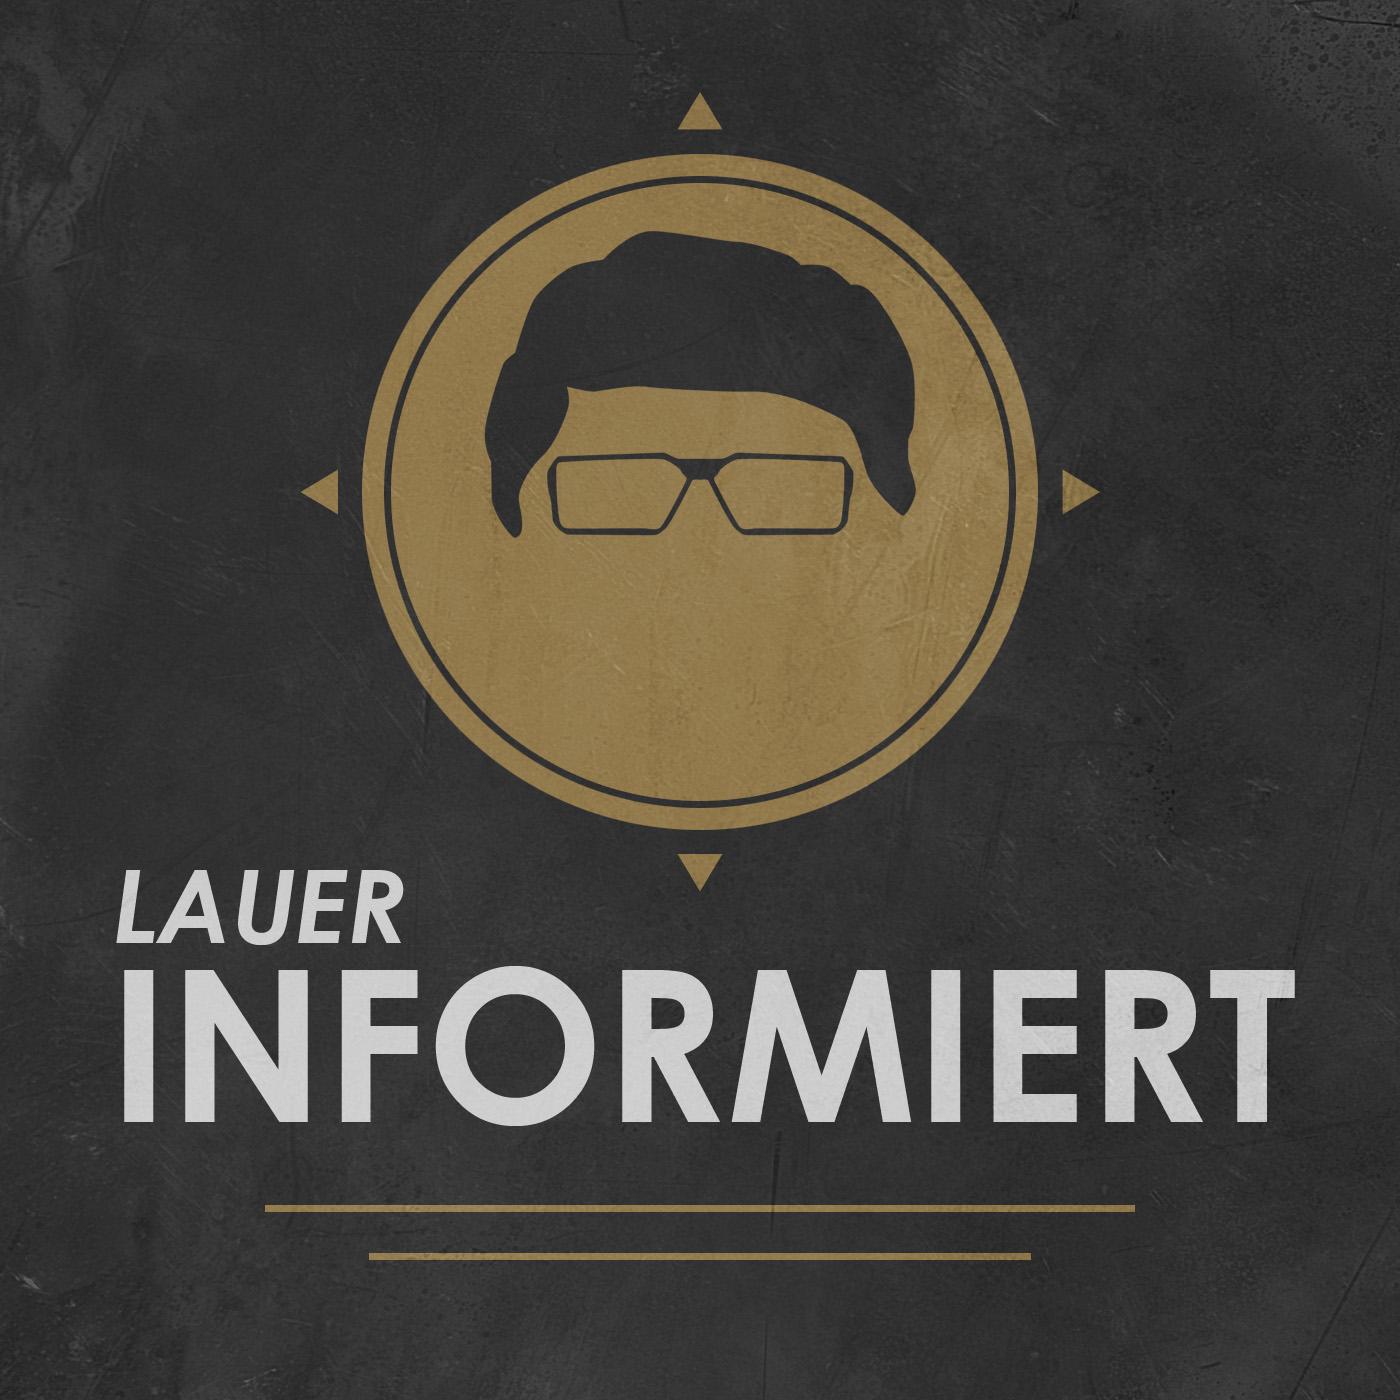 Lauer informiert